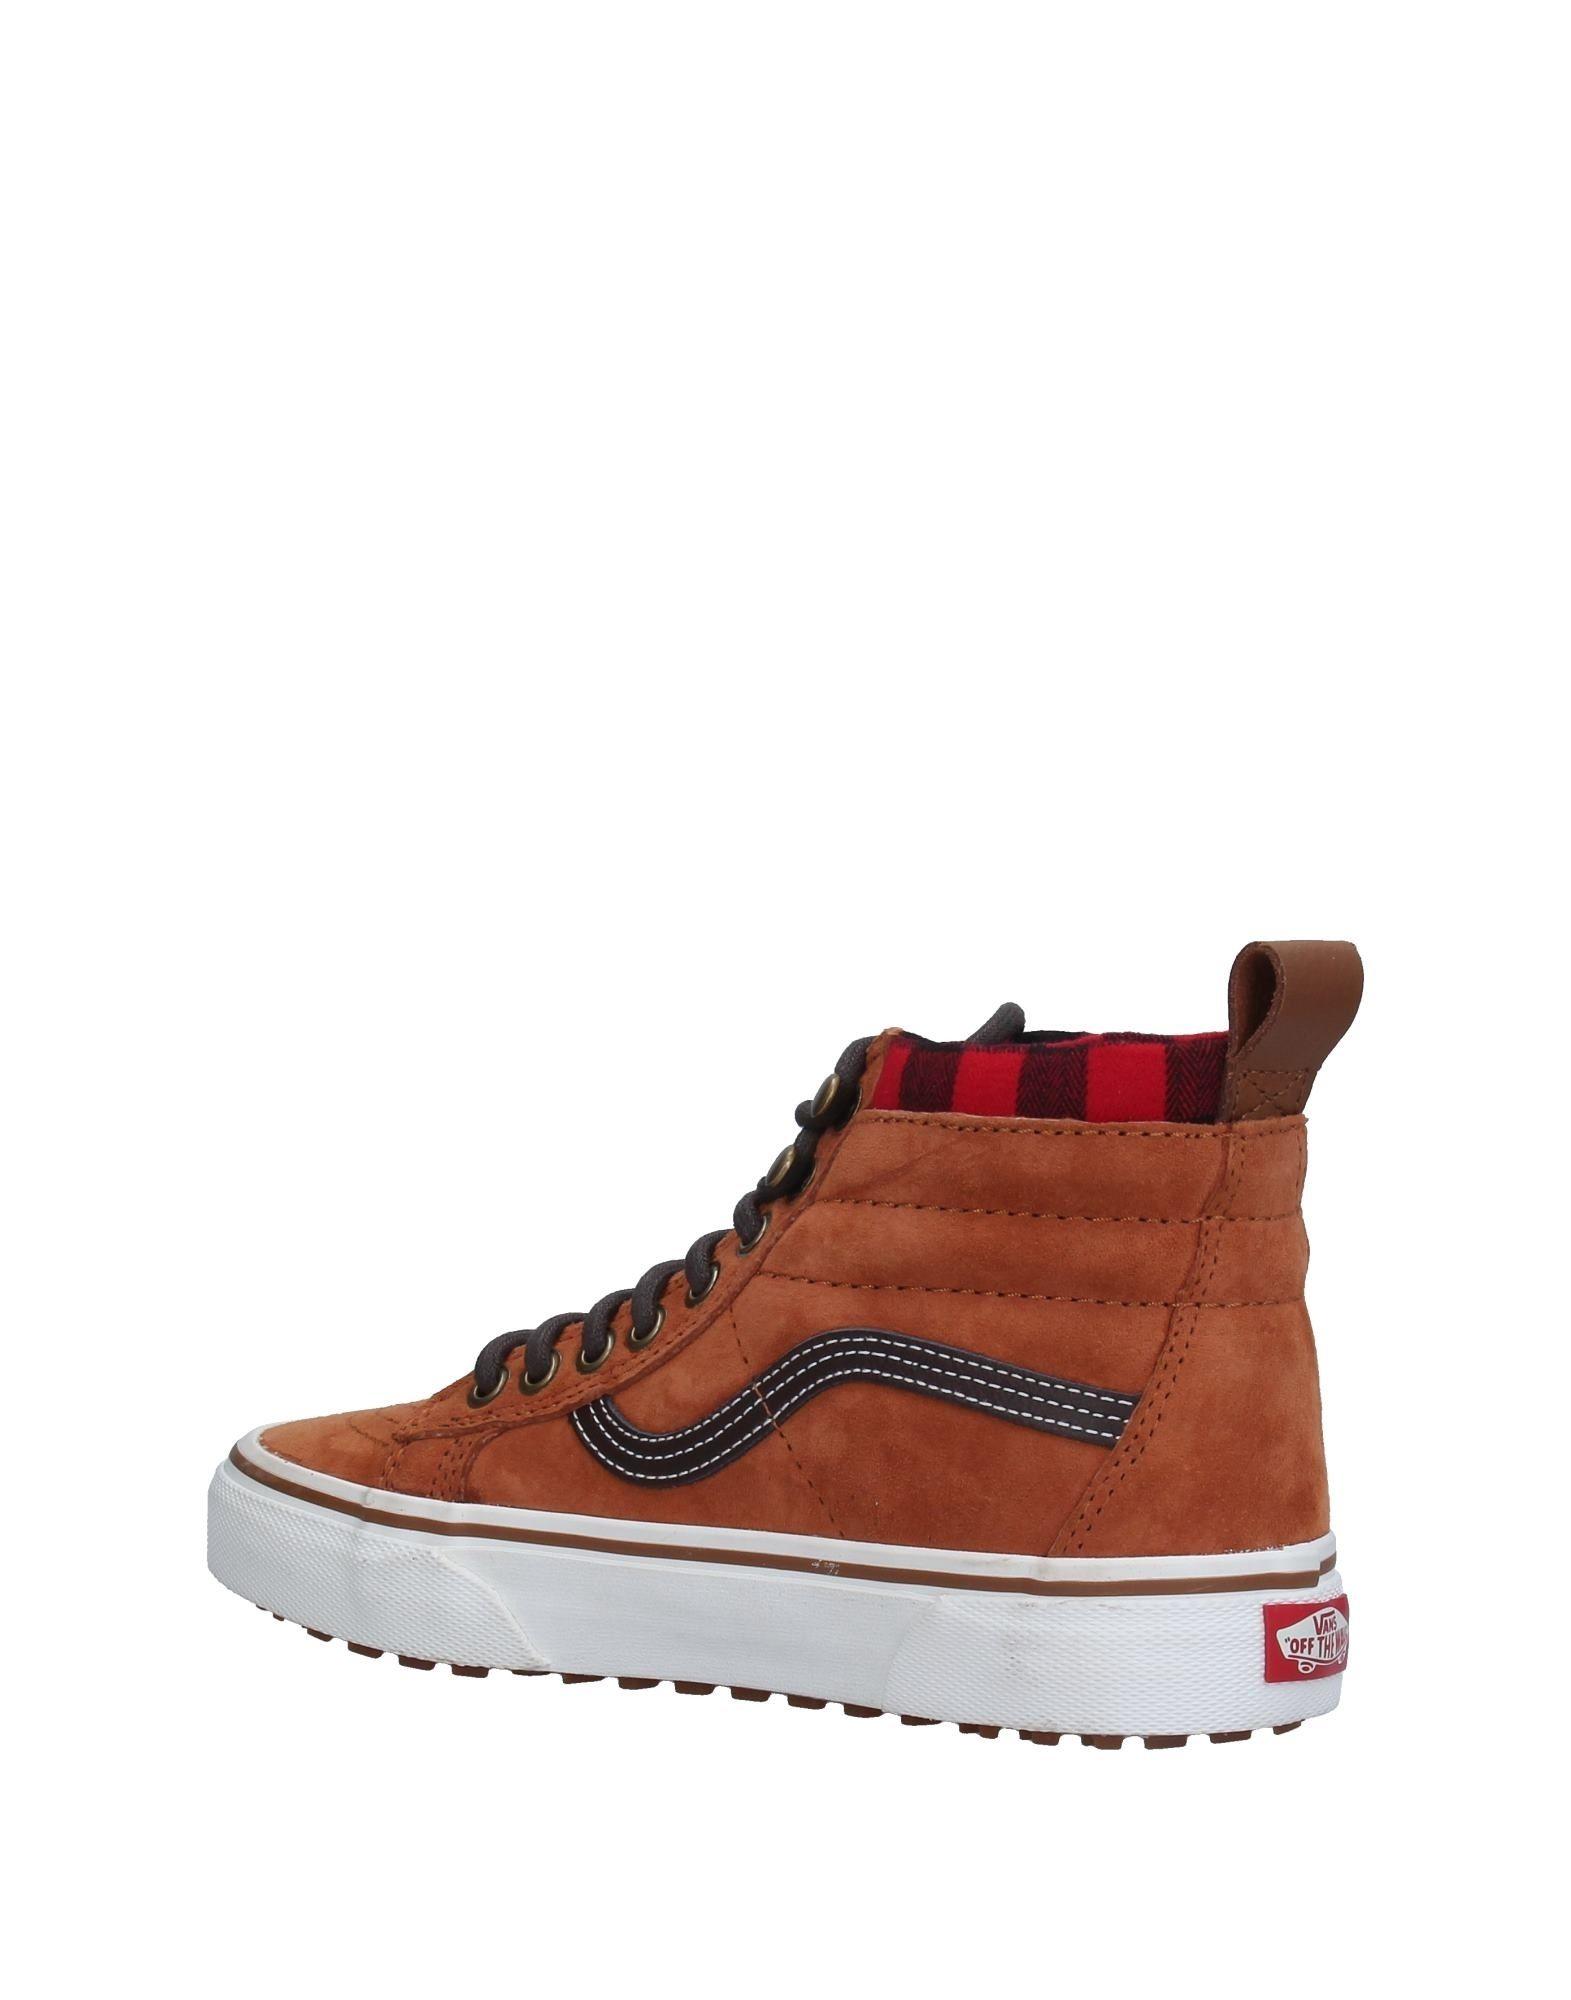 Vans Sneakers Sneakers Vans Damen  11280723SD  a7a18e